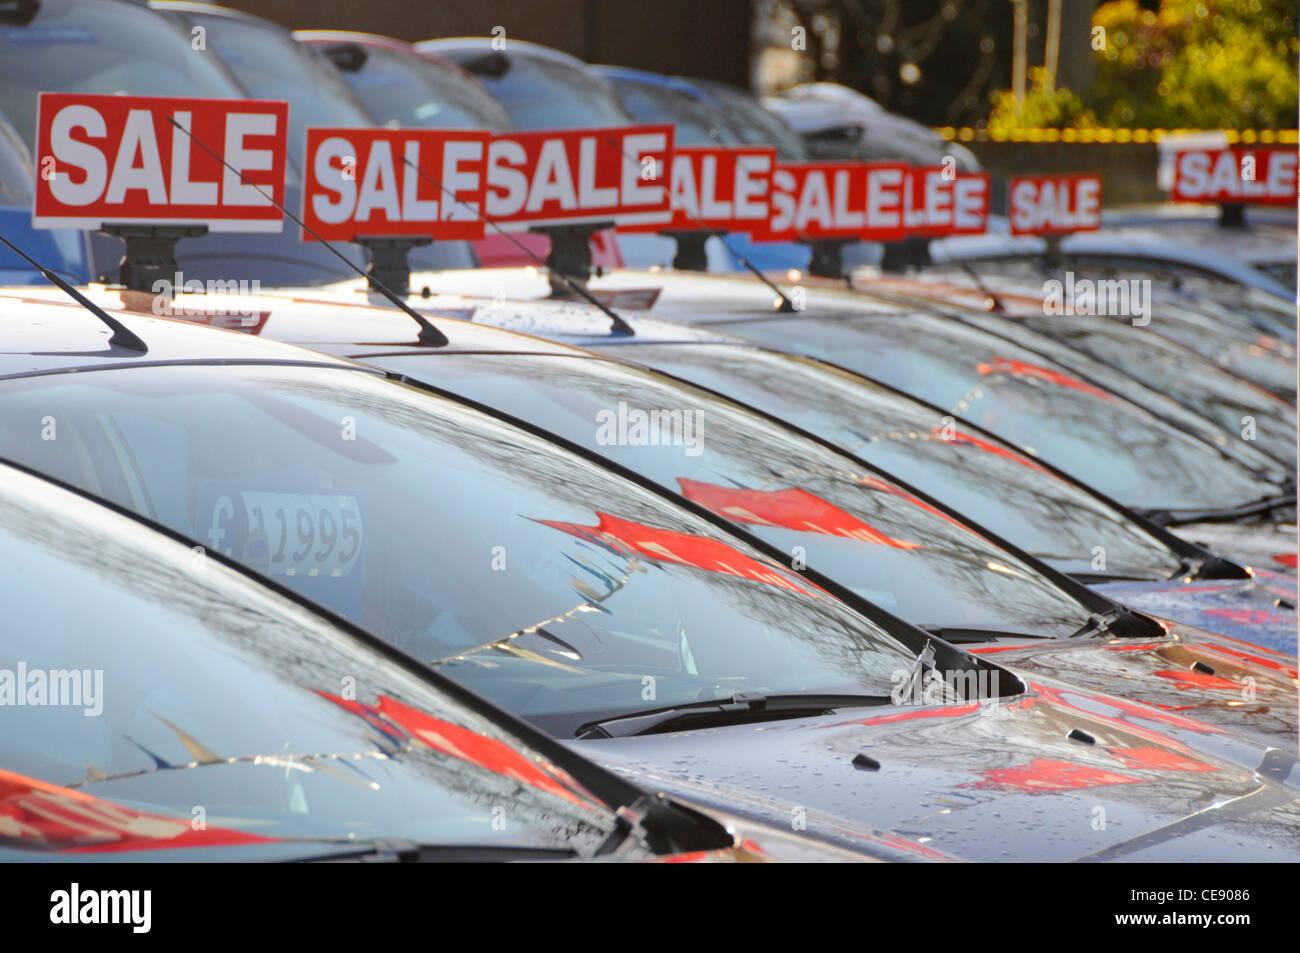 Car Sales Forecourt Stock Photos & Car Sales Forecourt Stock Images ...